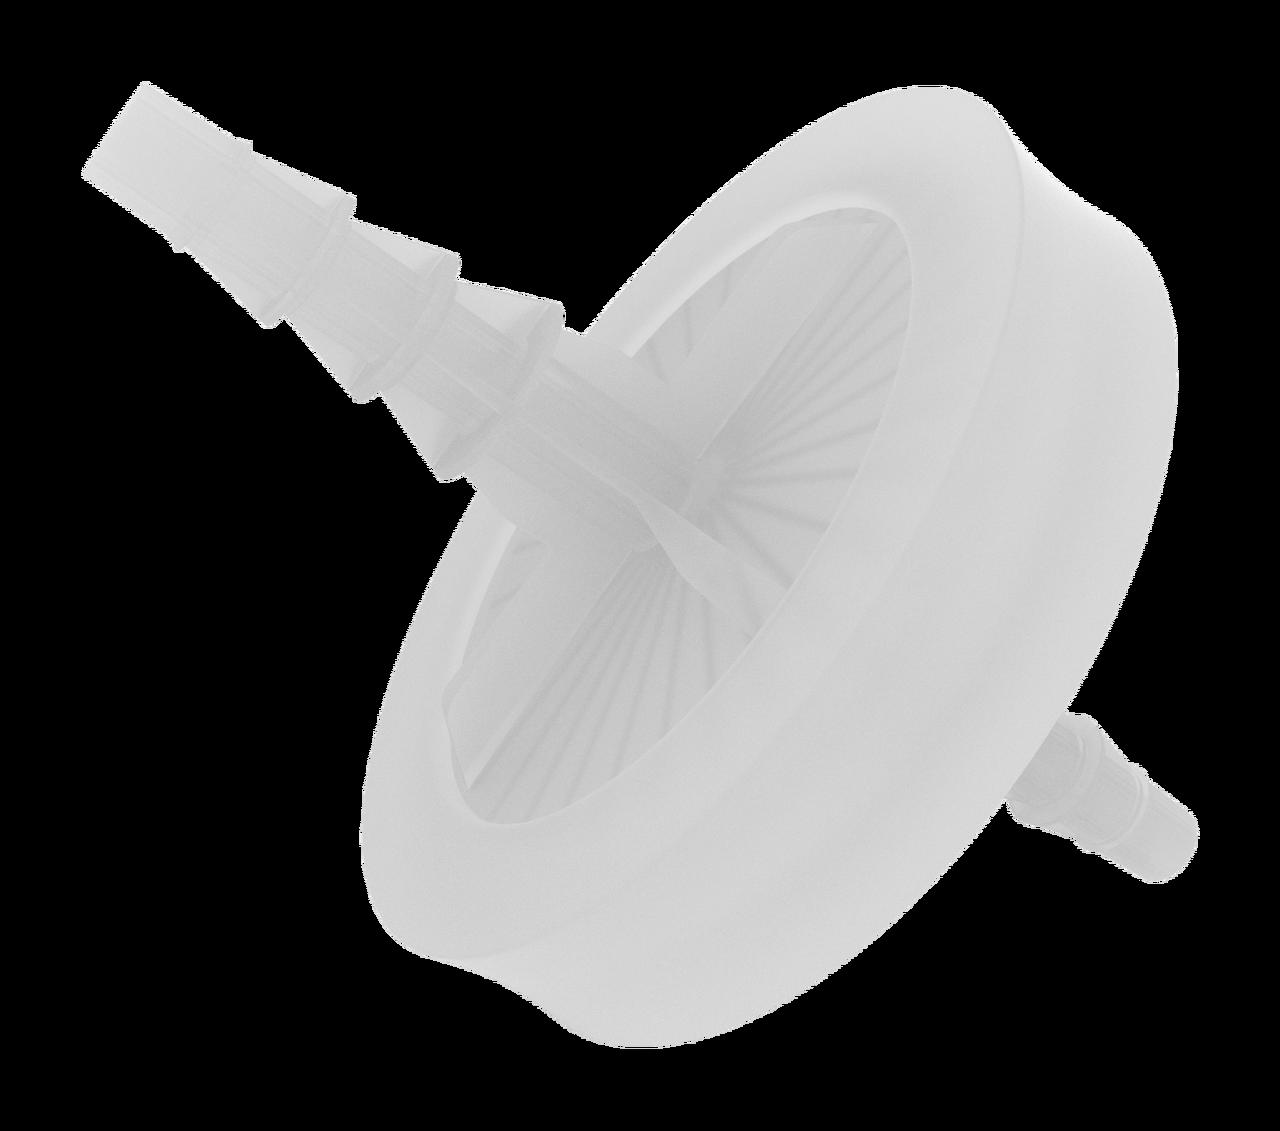 EZBio® Vent Filter, 0.22µm Non-Sterile, 40mm, Autoclave Only, Each